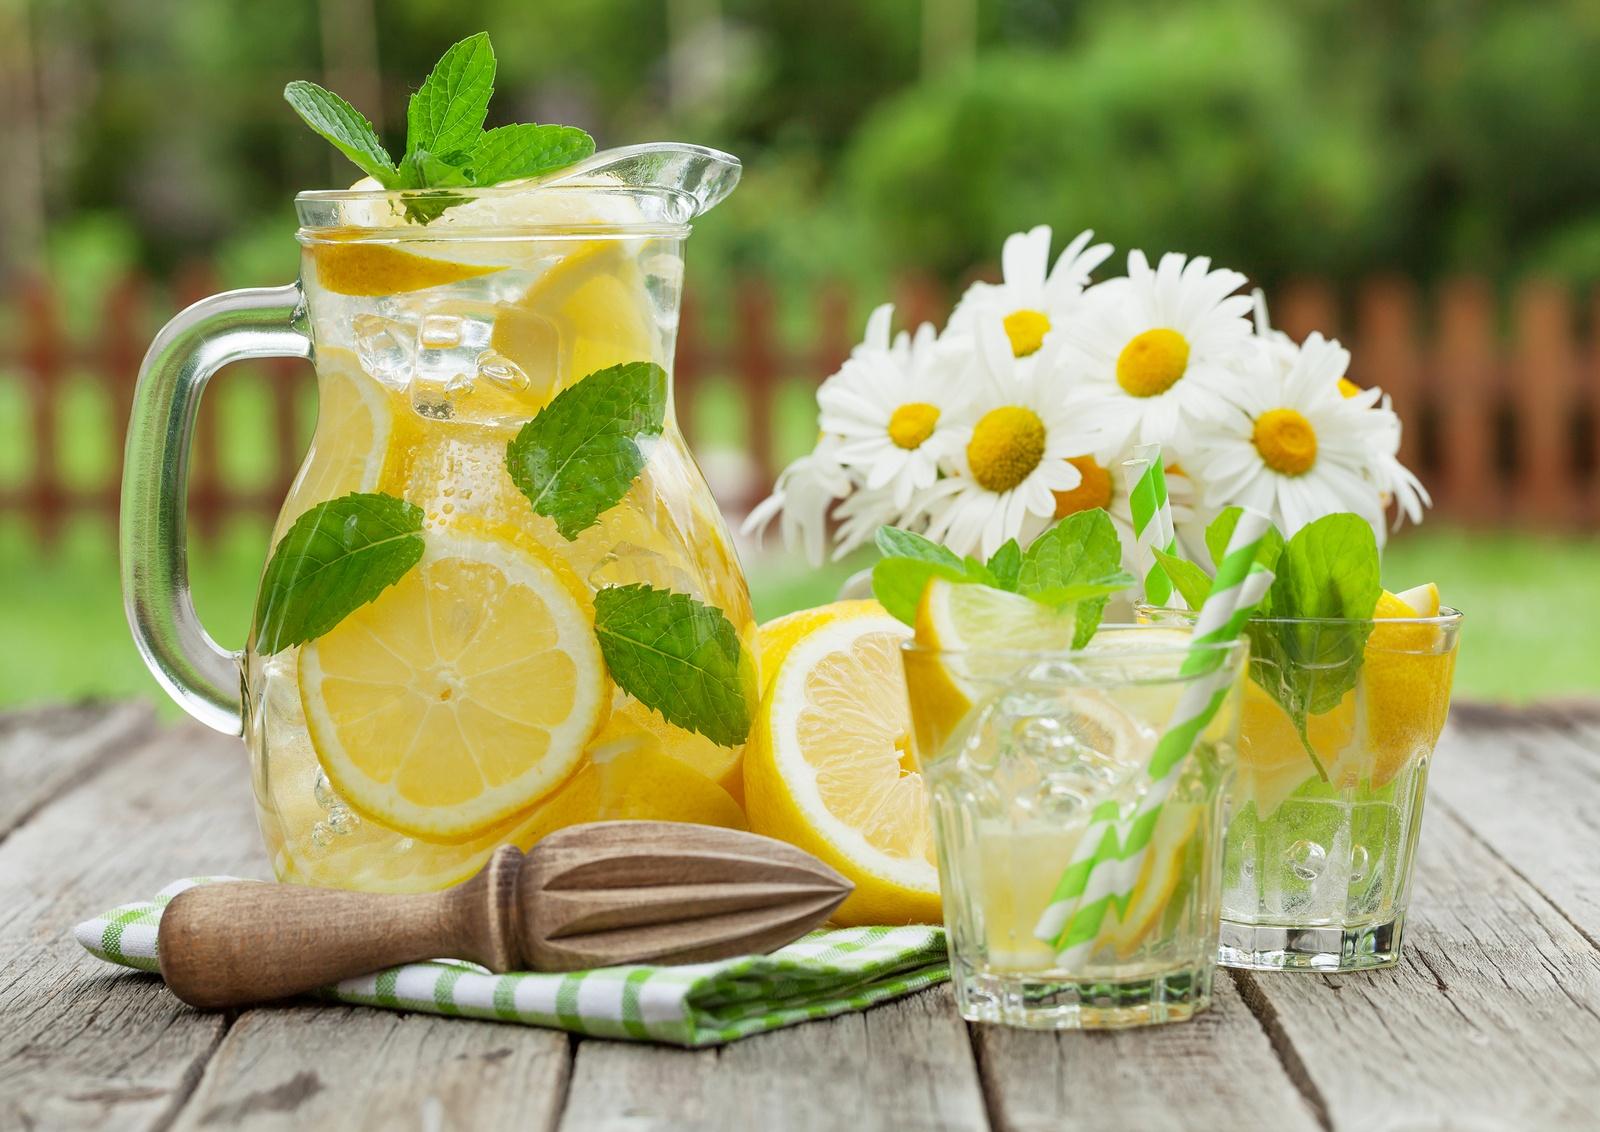 bigstock-Lemonade-with-lemon-mint-and--138135725.jpg